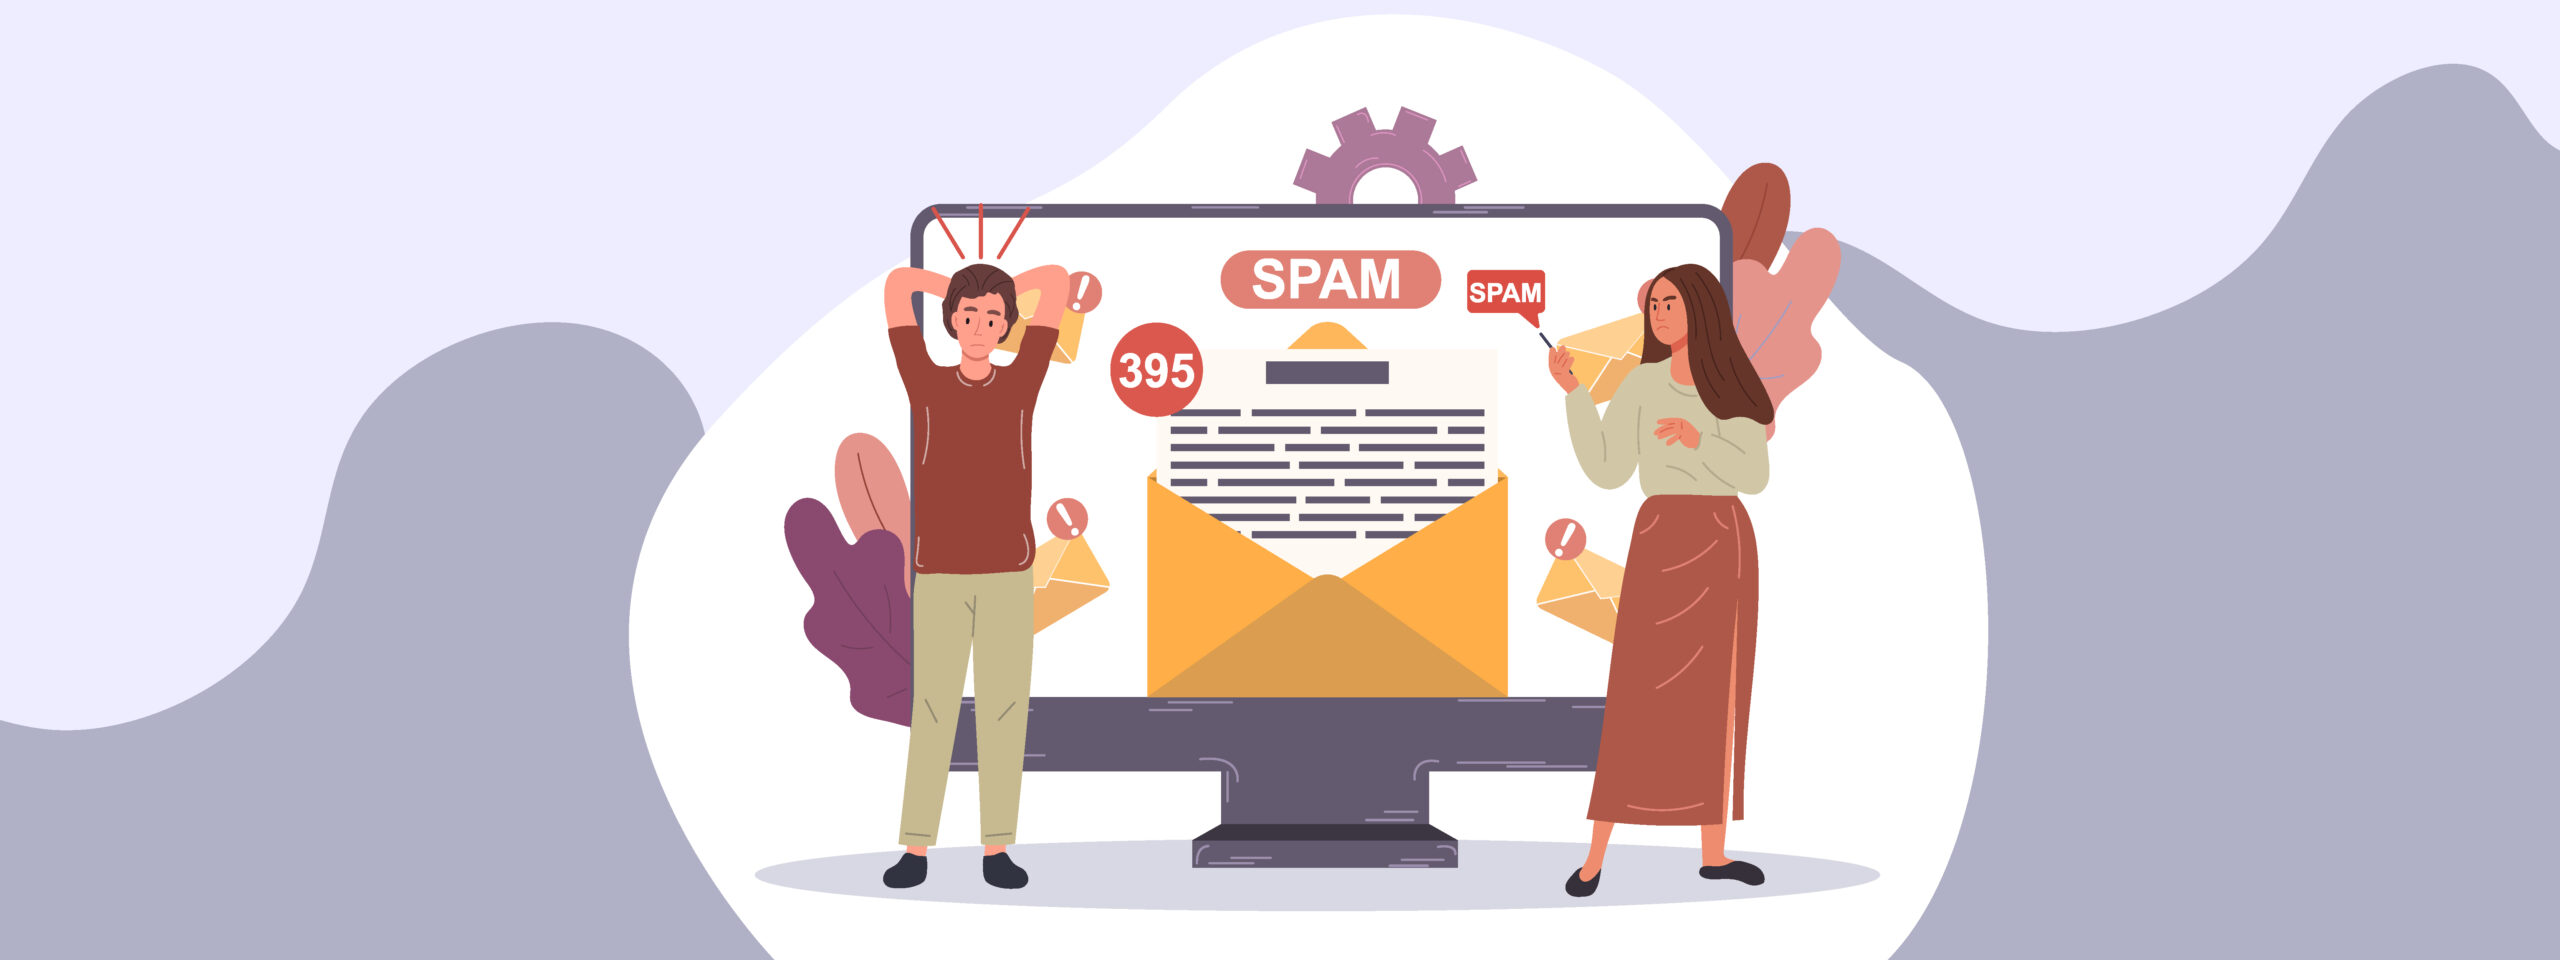 How do I protect myself from Trojan | Computing Australia